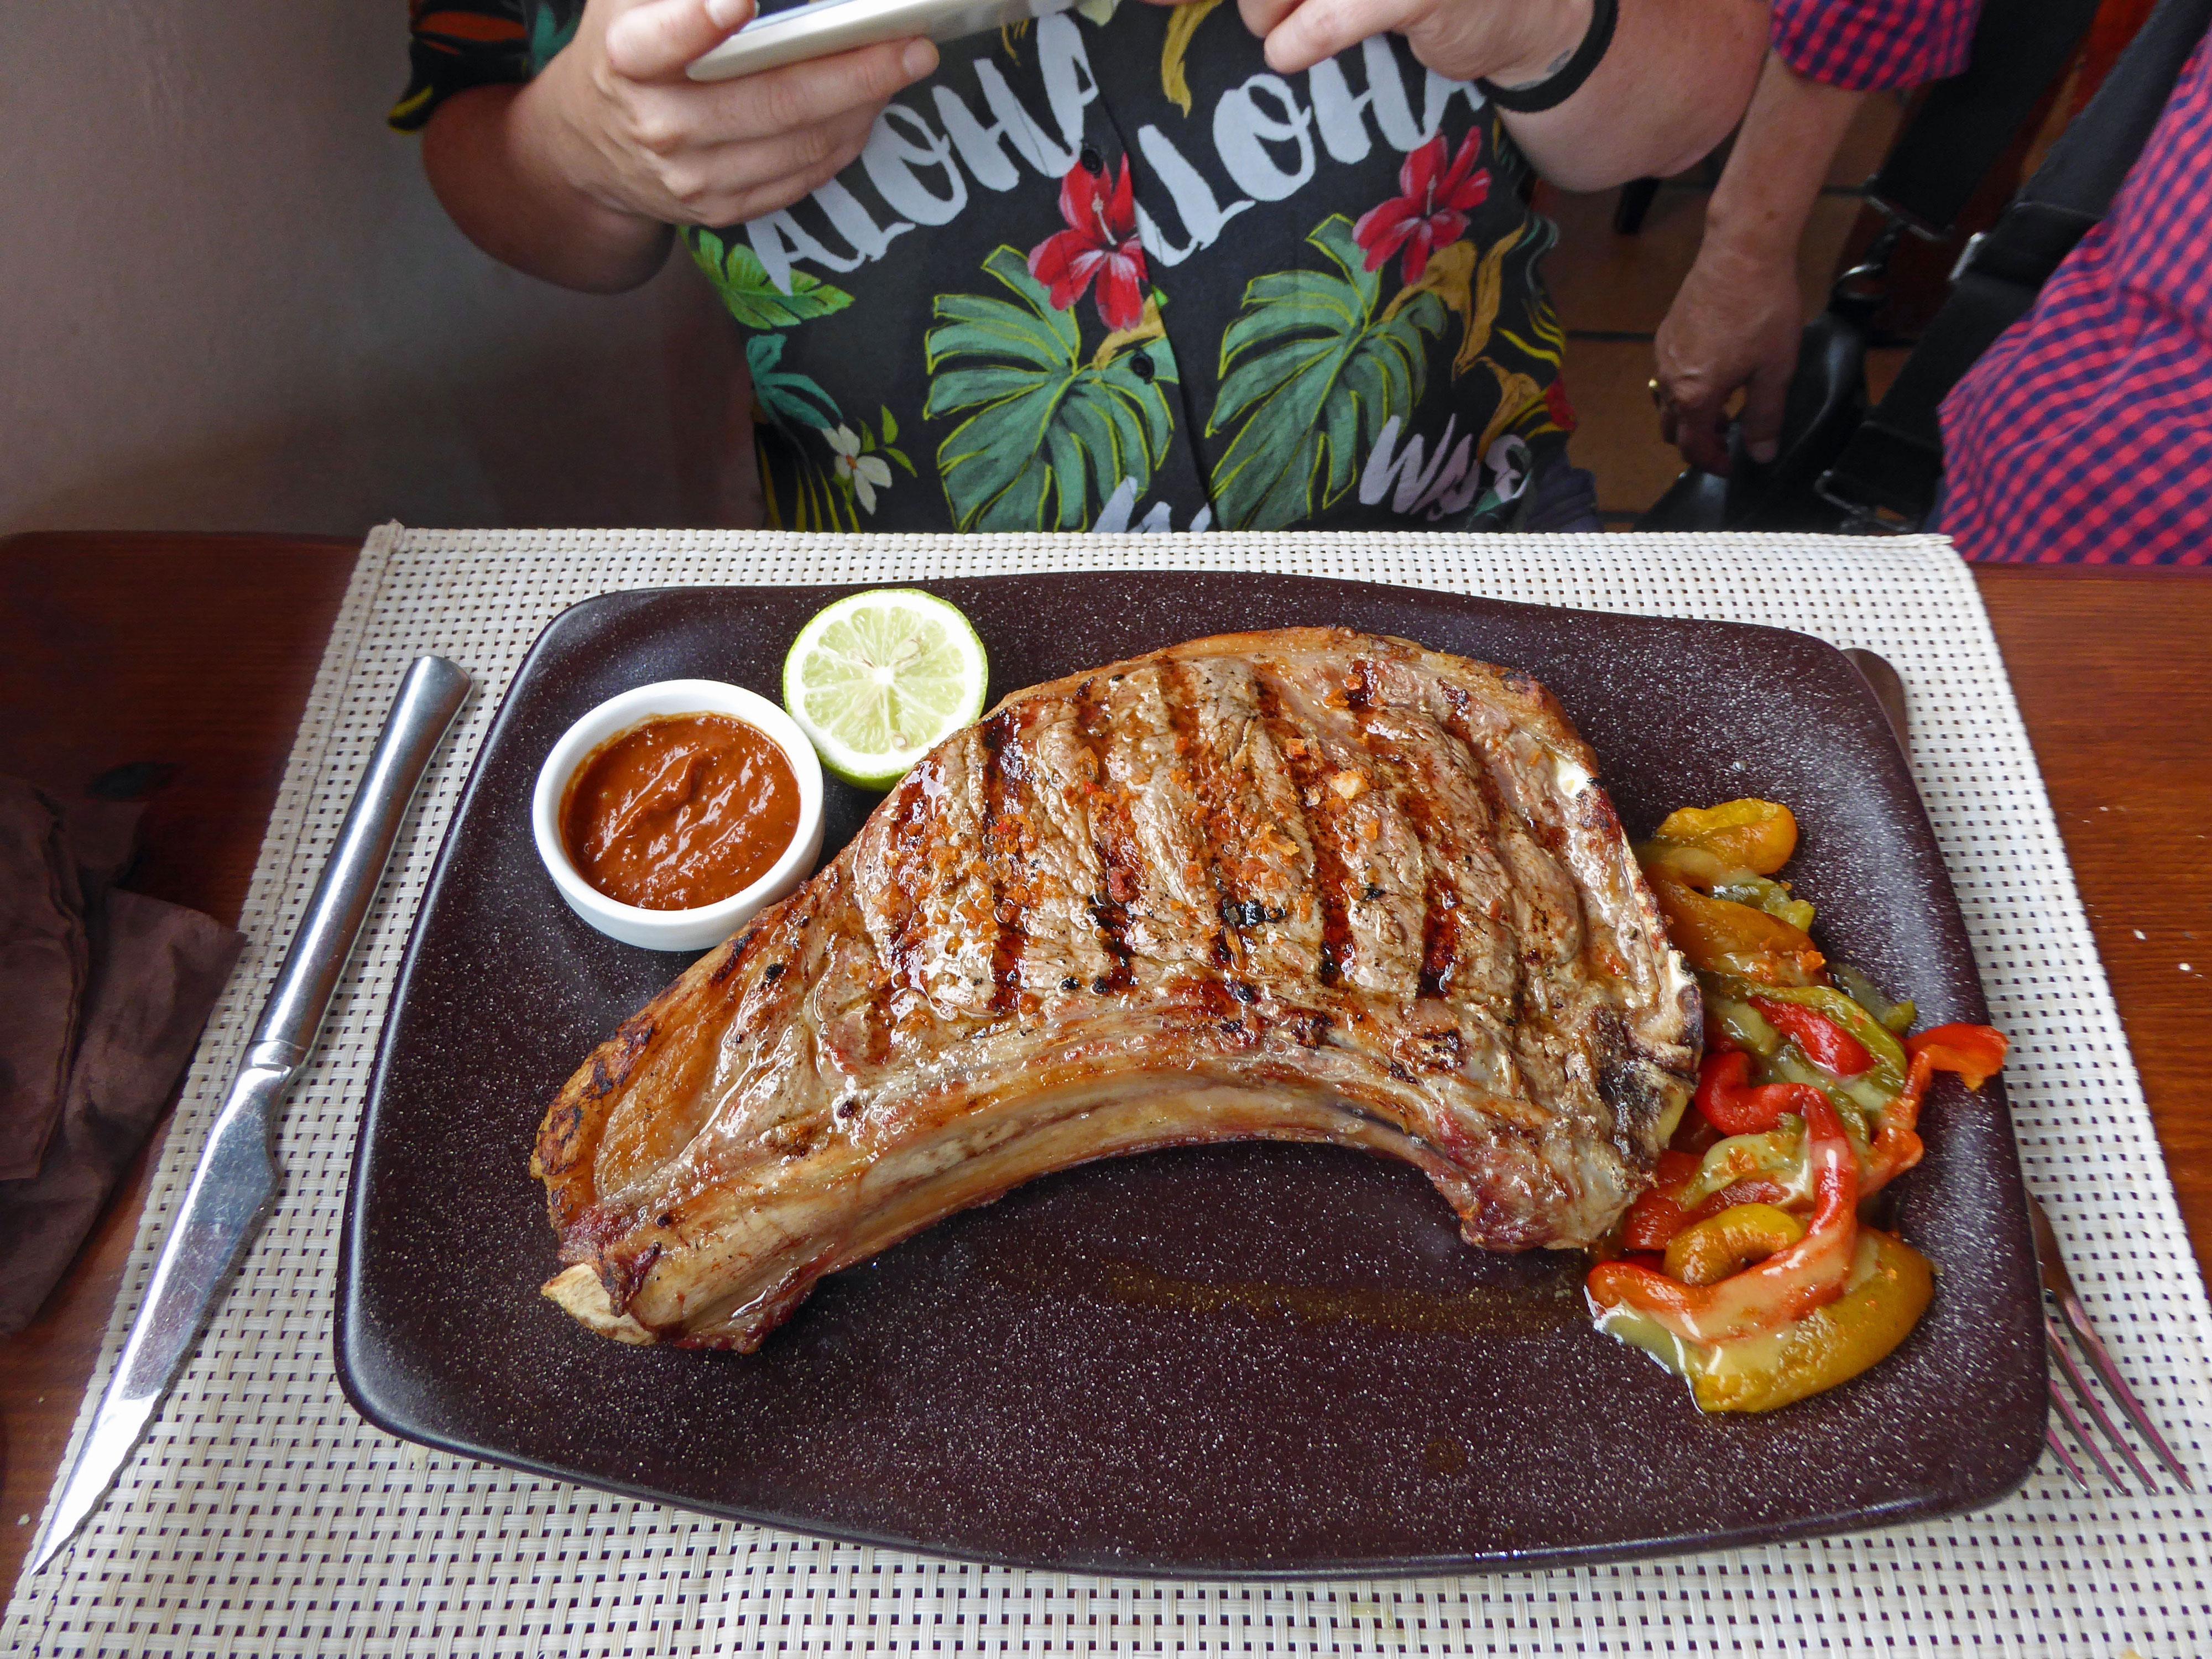 Restaurante San Diego Chuleton de novillo a la parrilla, 850 gr